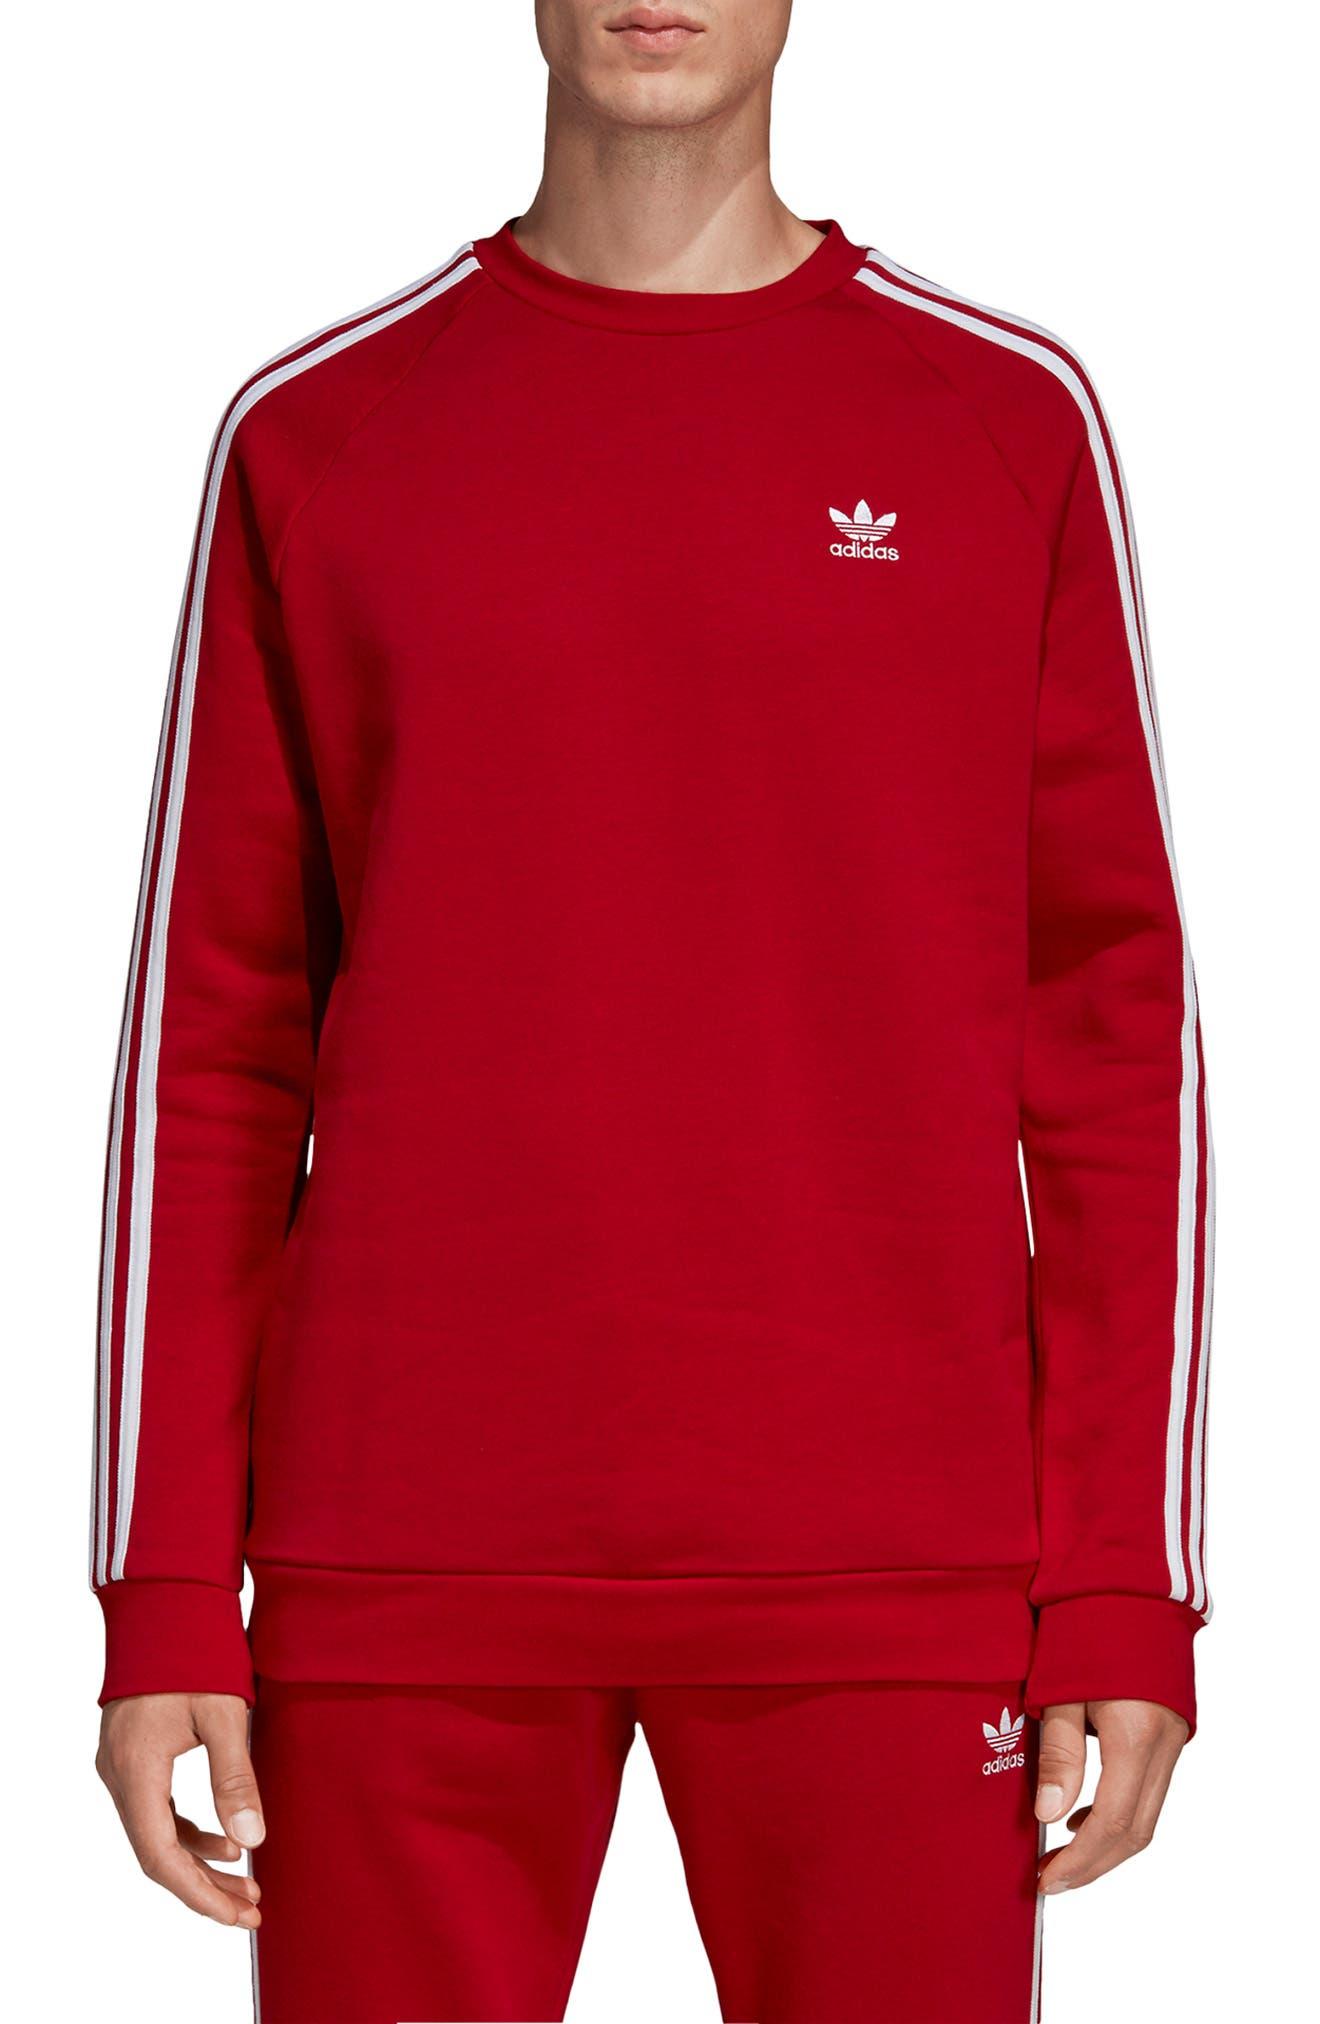 ADIDAS ORIGINALS 3-Stripes Raglan Sweatshirt, Main, color, POWER RED